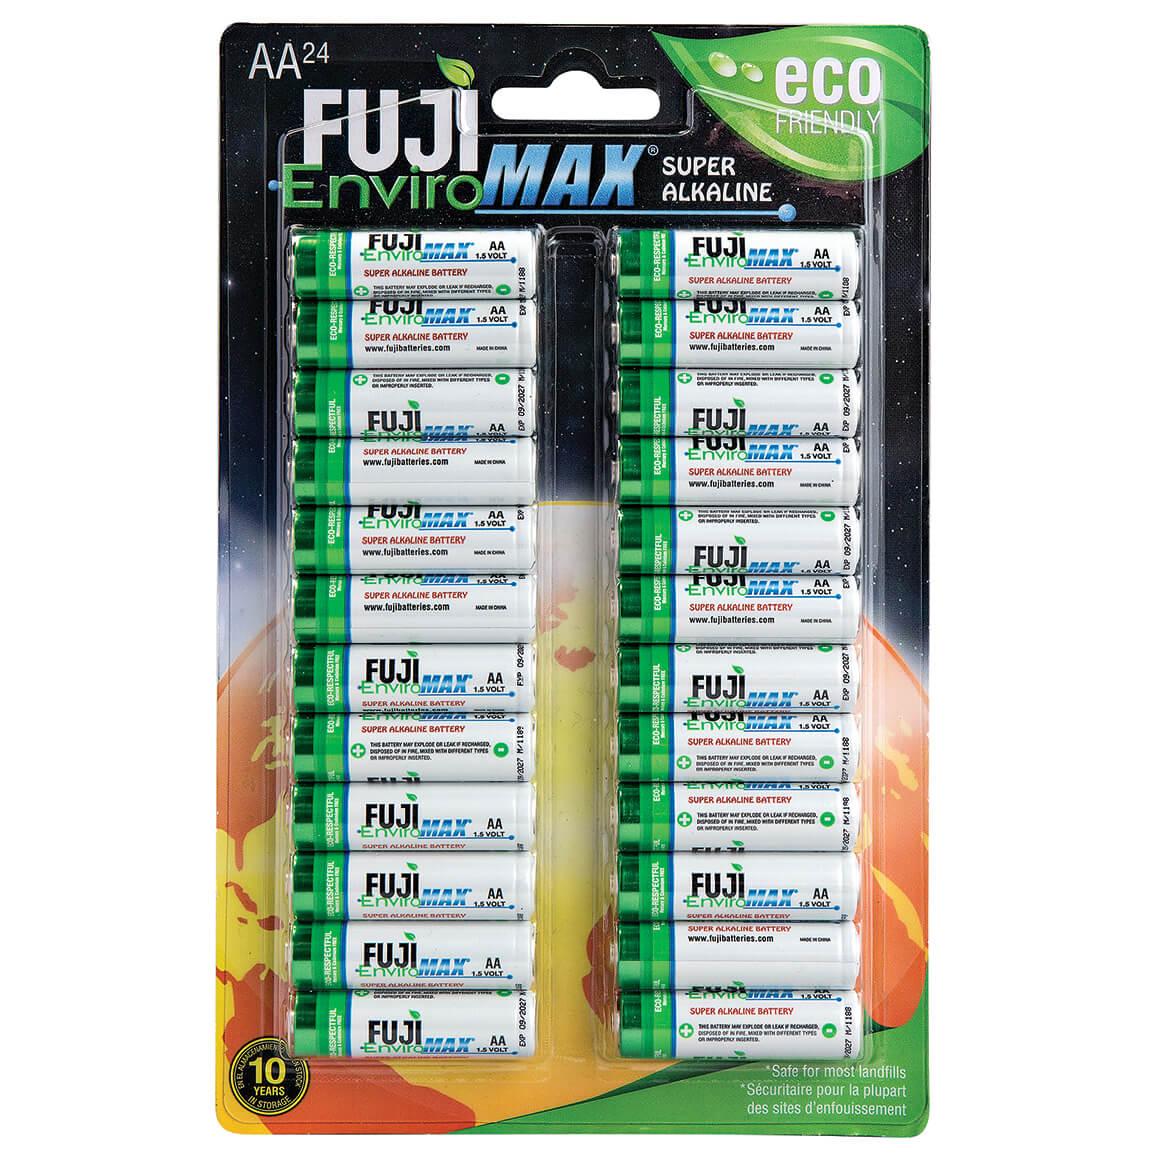 Fuji Super Alkaline AA Batteries, 24 Pack-364147